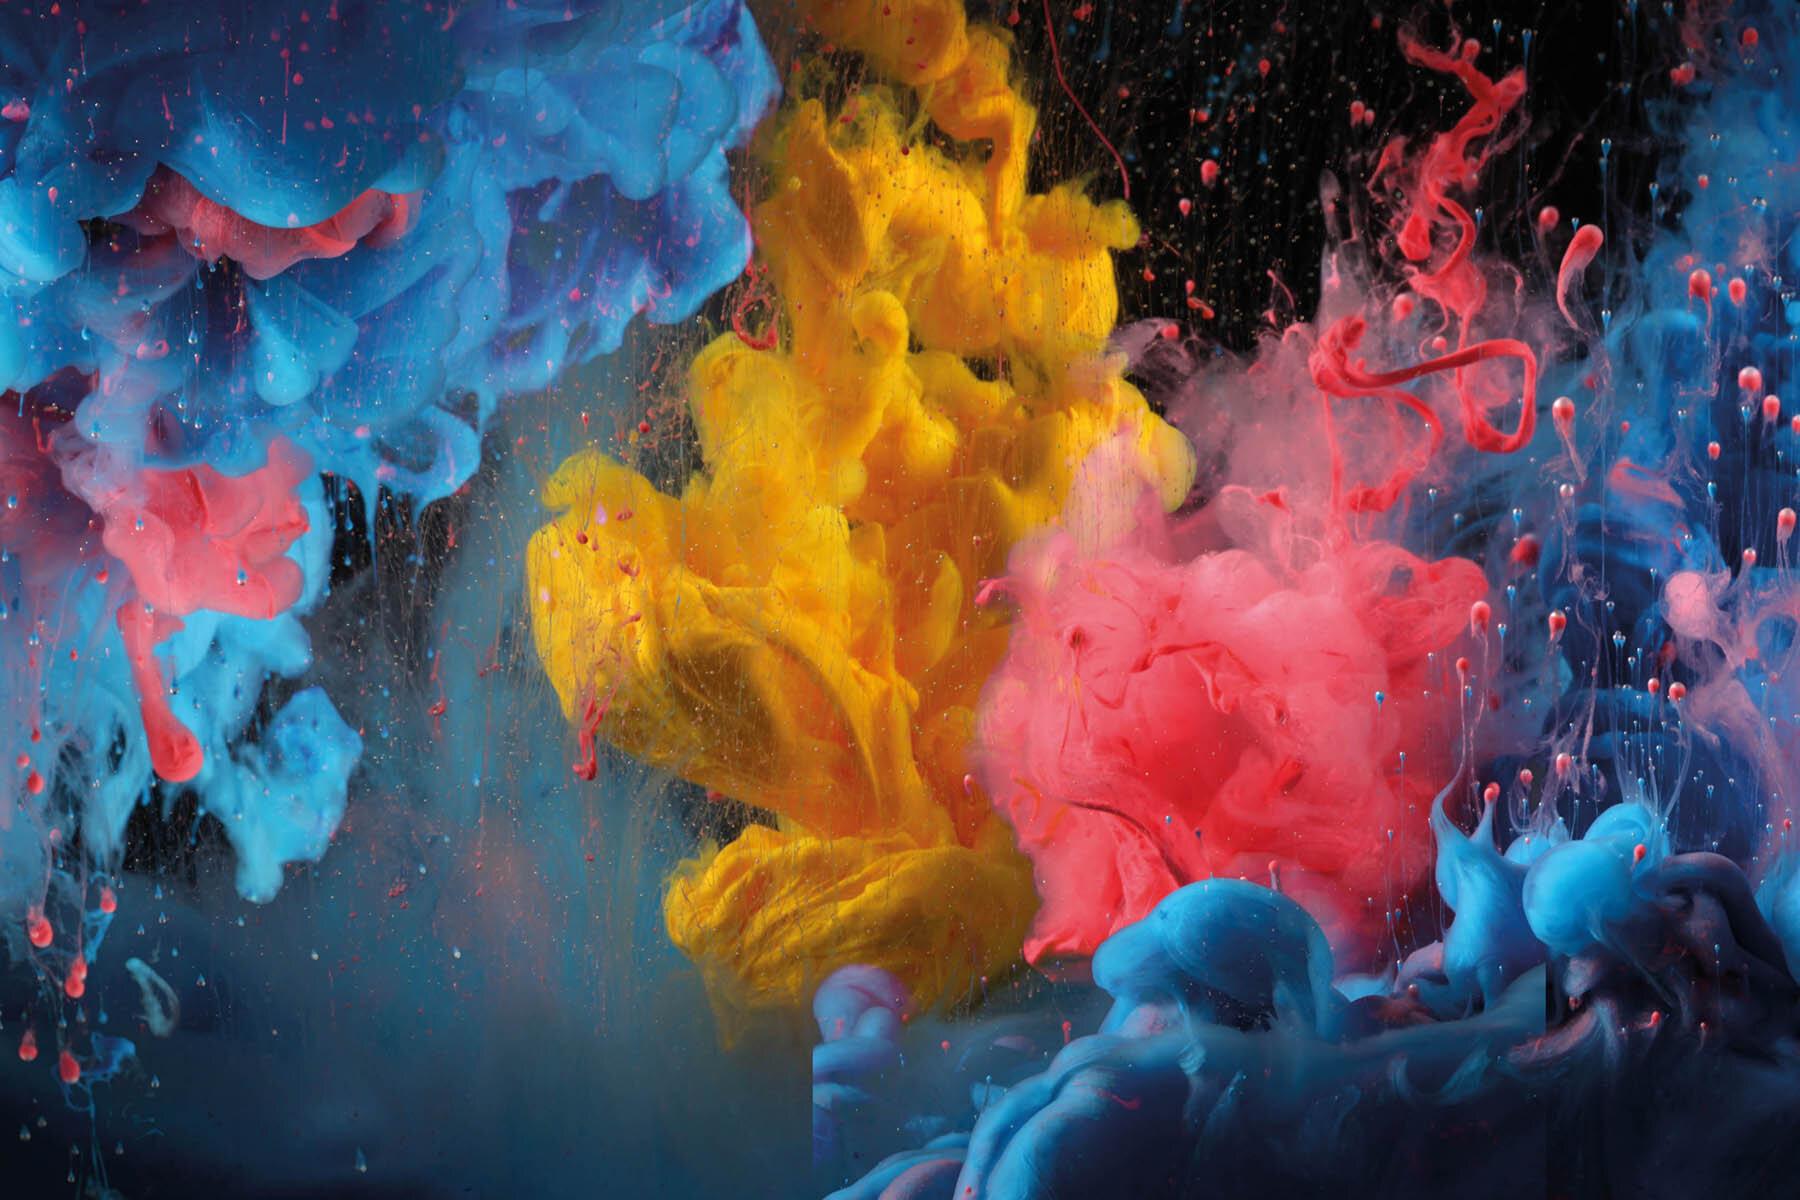 PlateART Duschrückwand mit Motiv Acrylfarben in Wasser